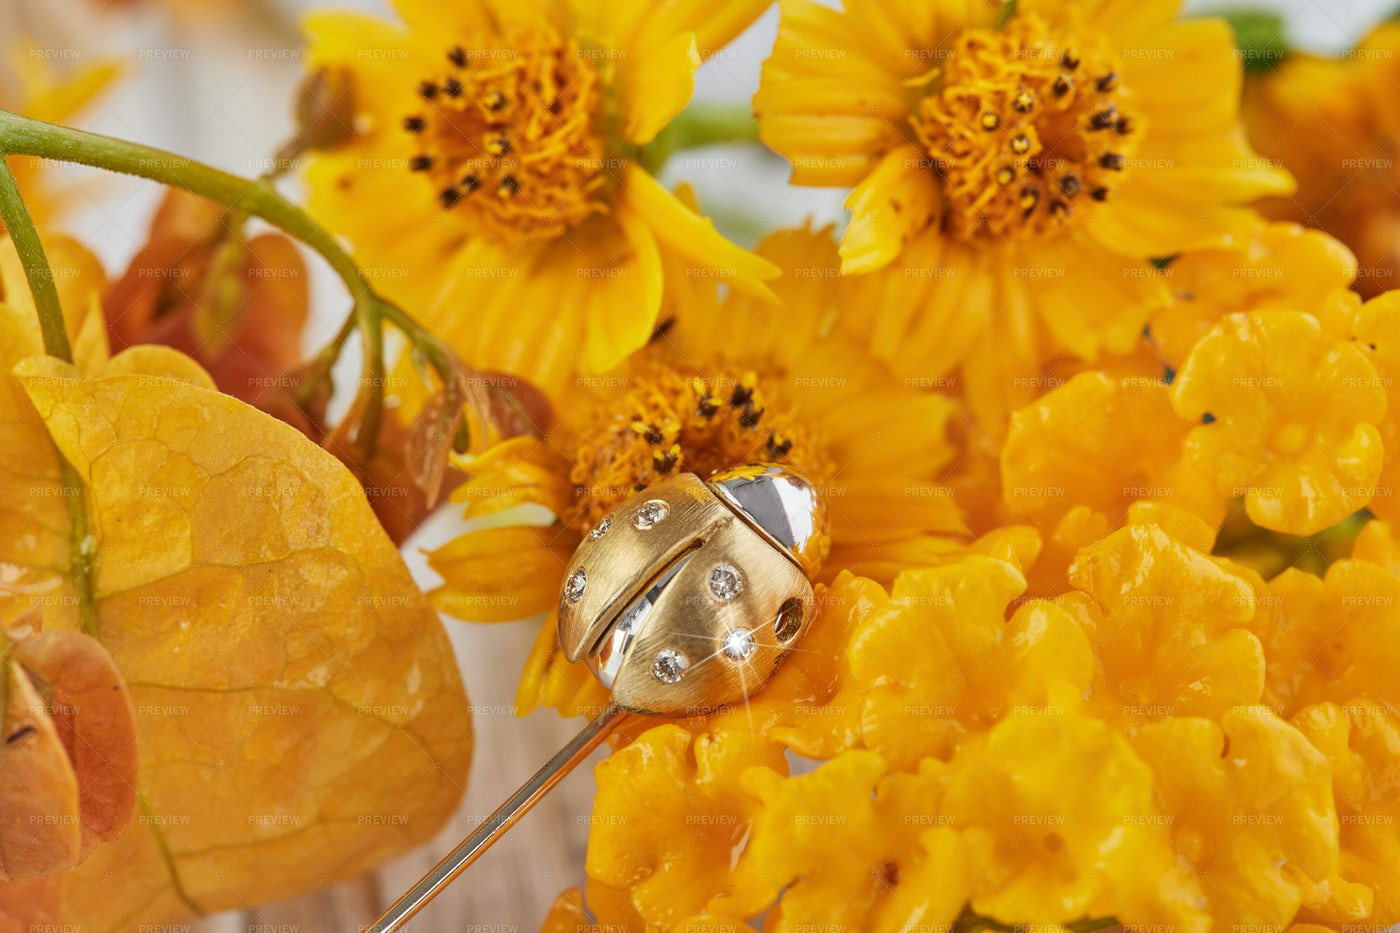 Ladybug Brooch On Flowers: Stock Photos